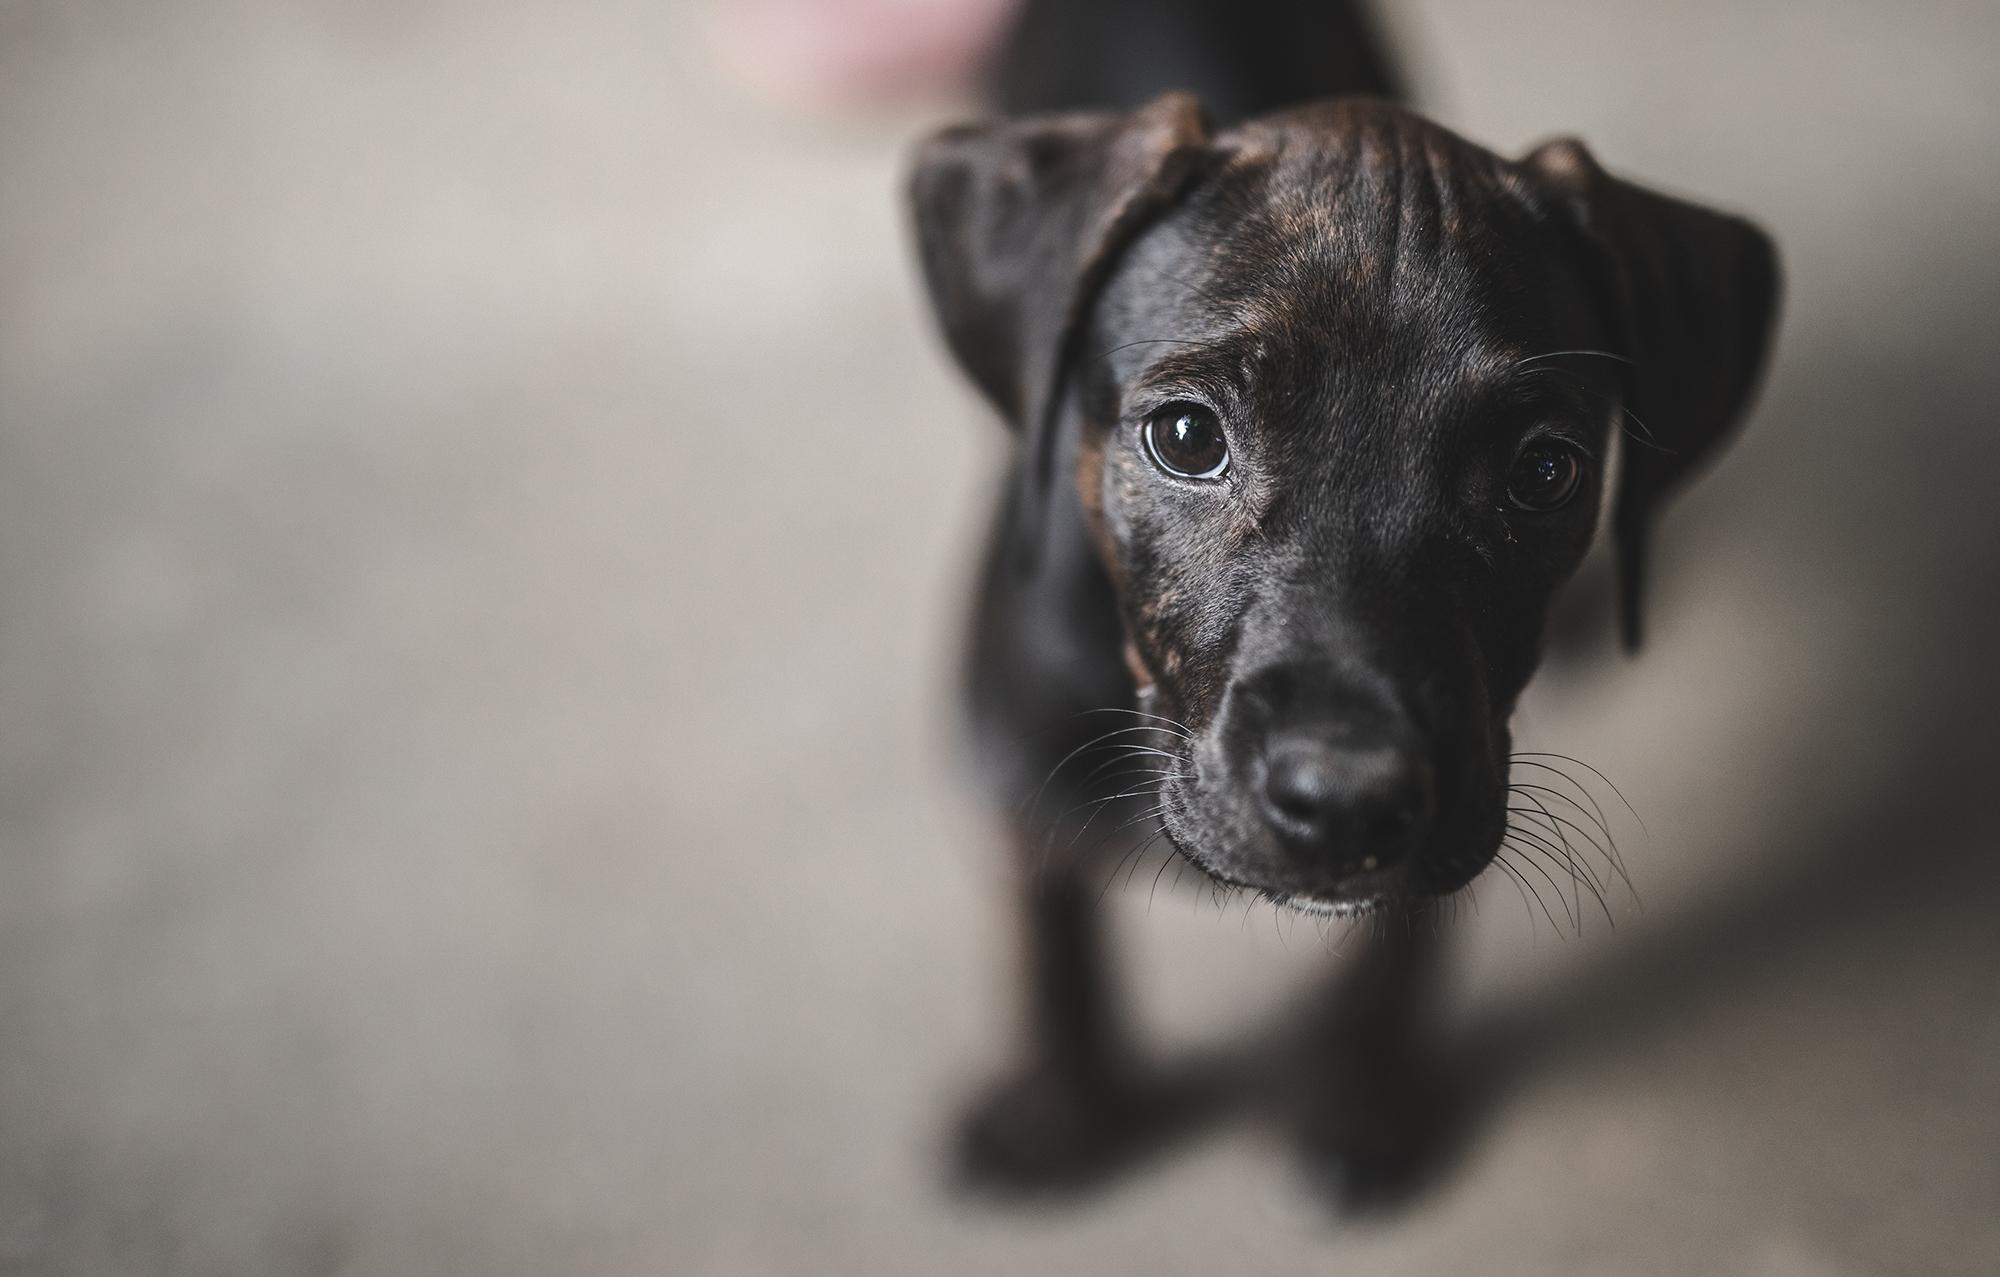 Home | Kids Hurting Animals | PETA